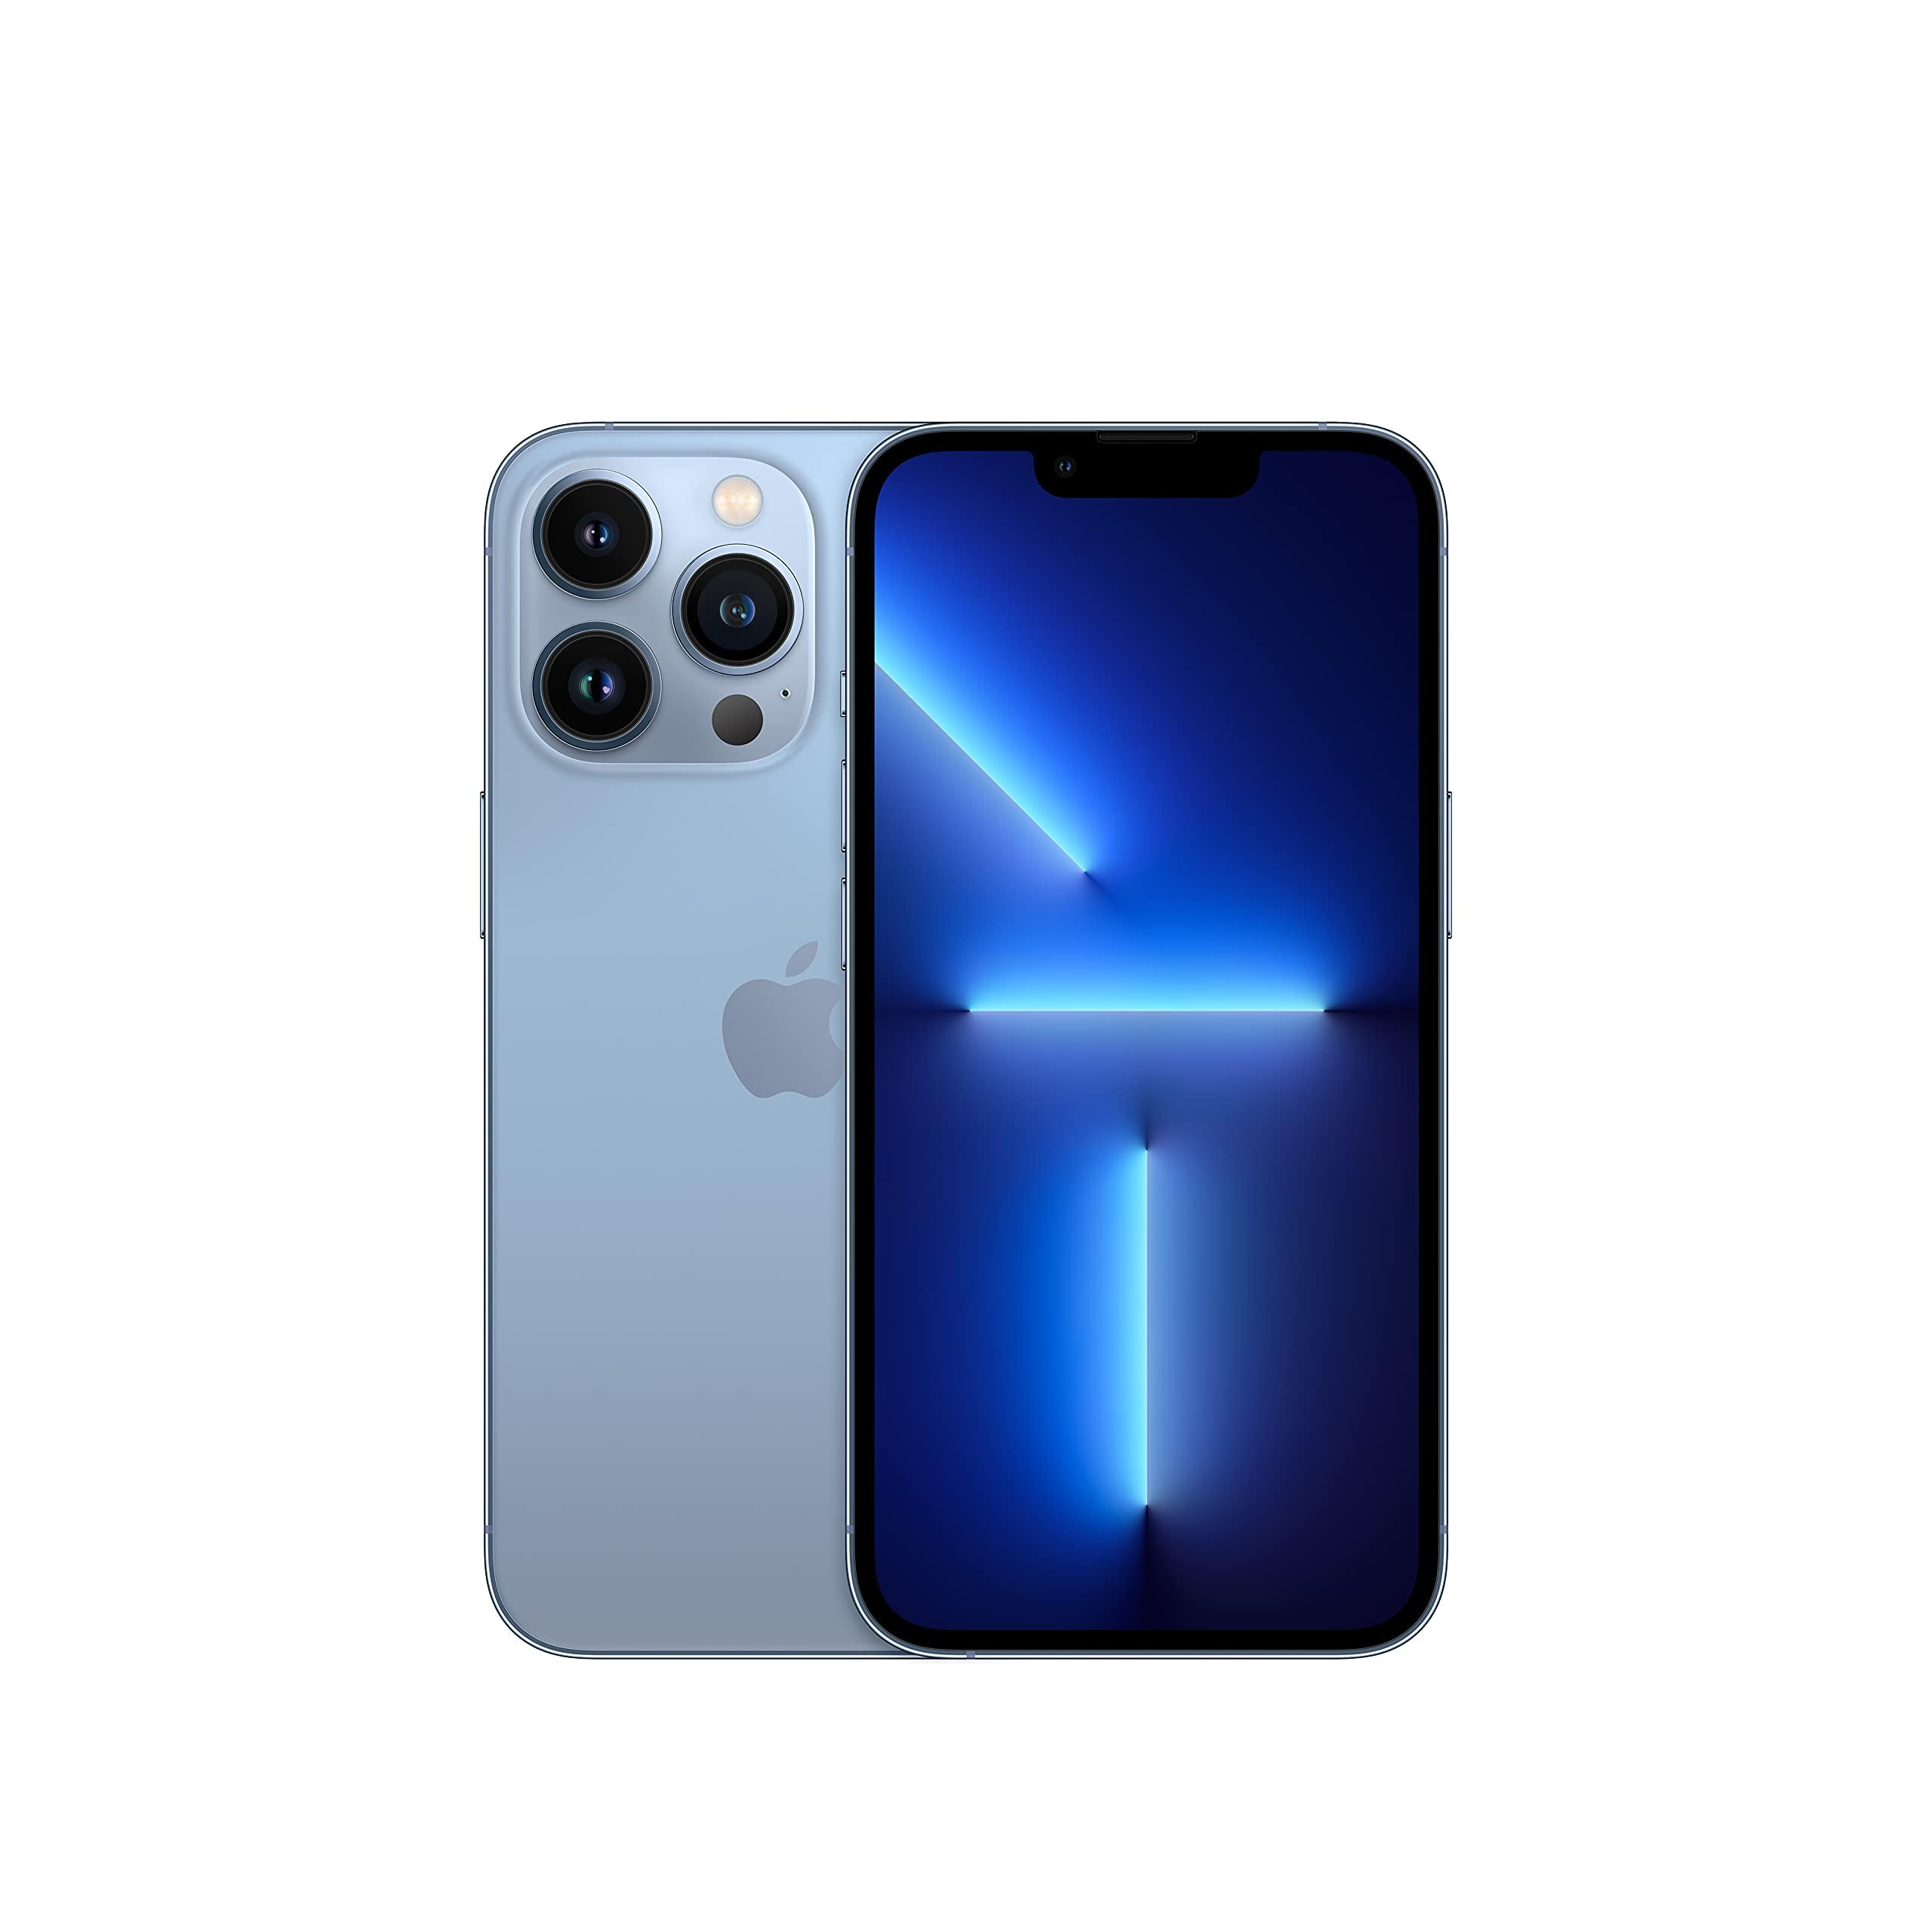 Apple iPhone 13 Pro (256GB) - Sierra Blue